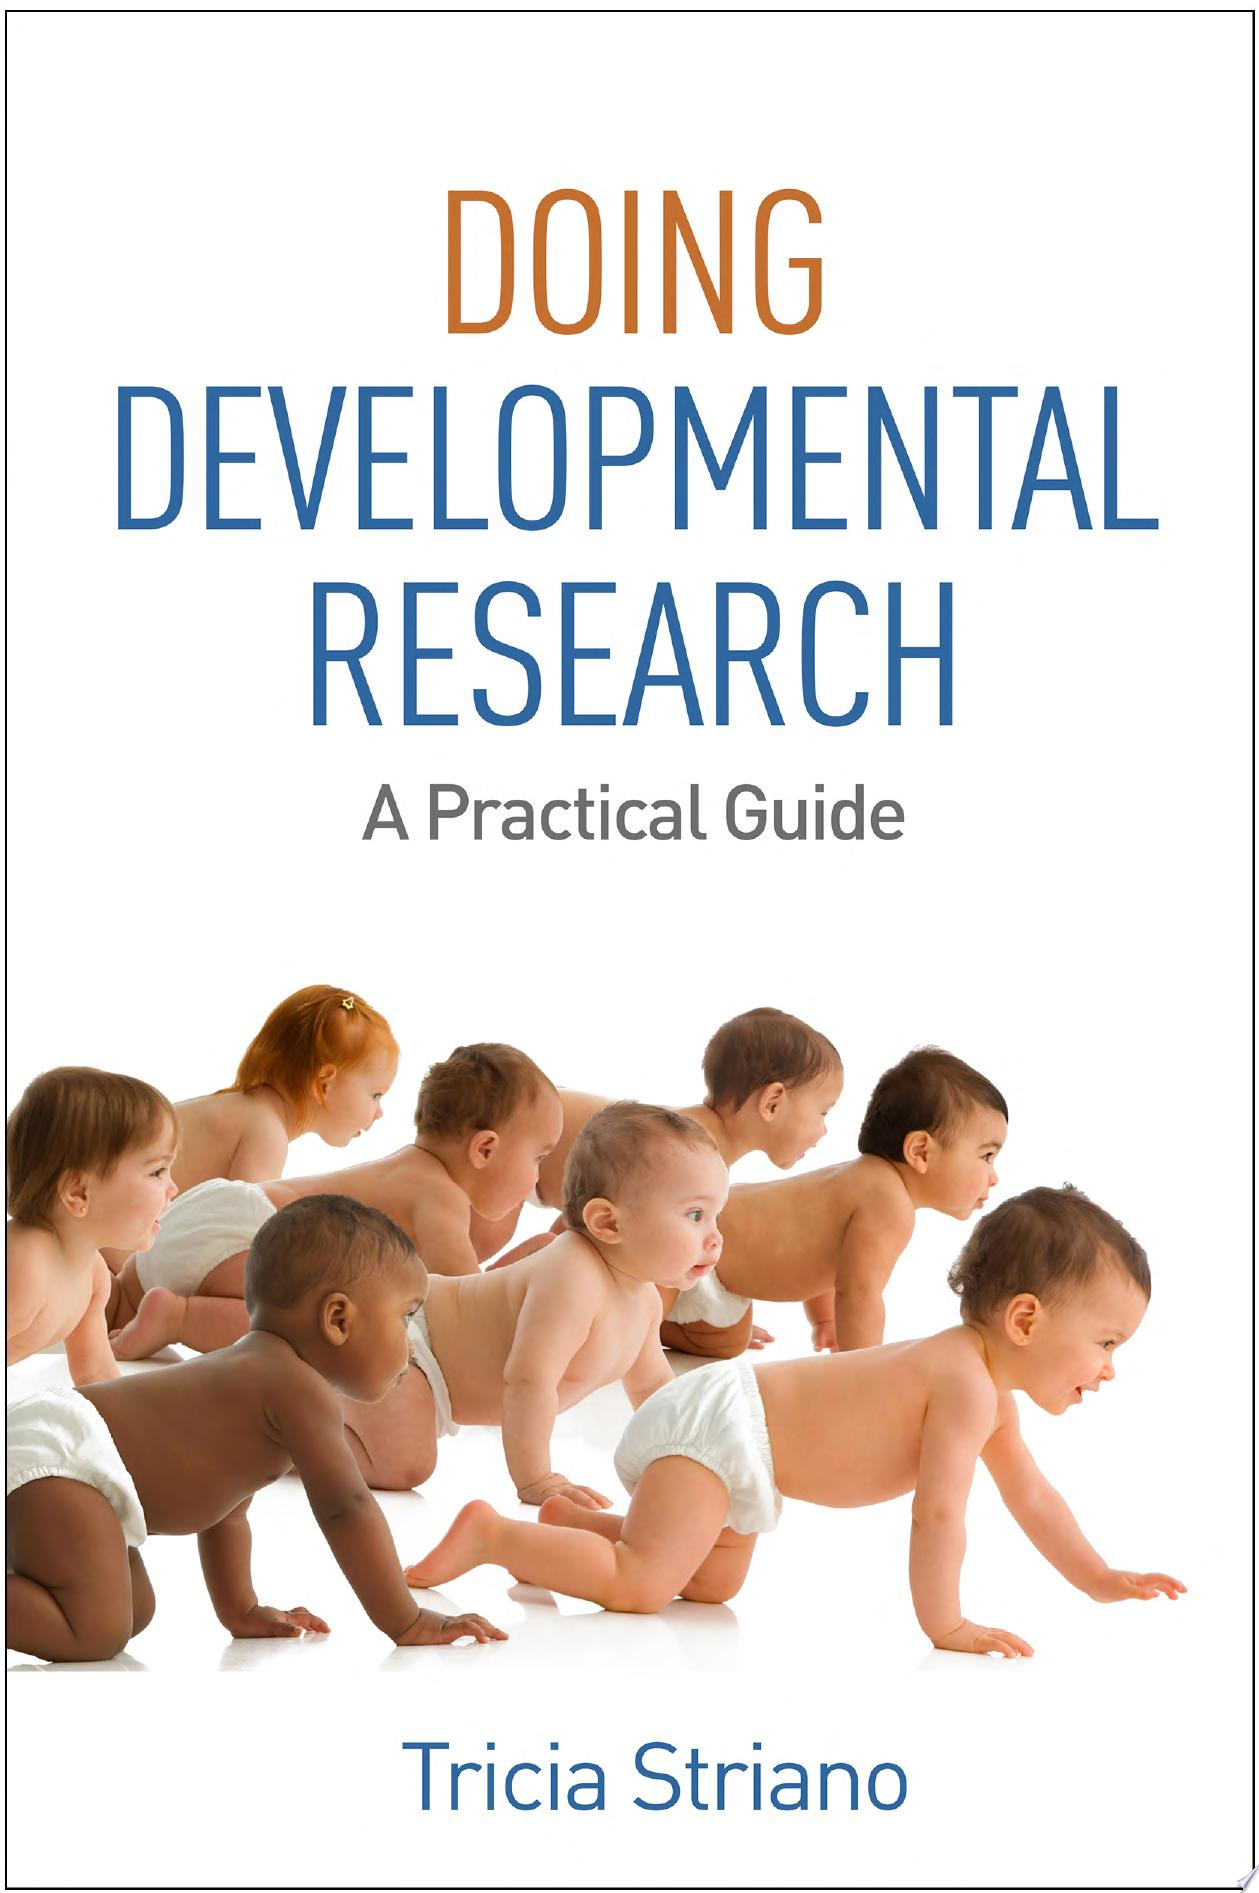 Doing Developmental Research